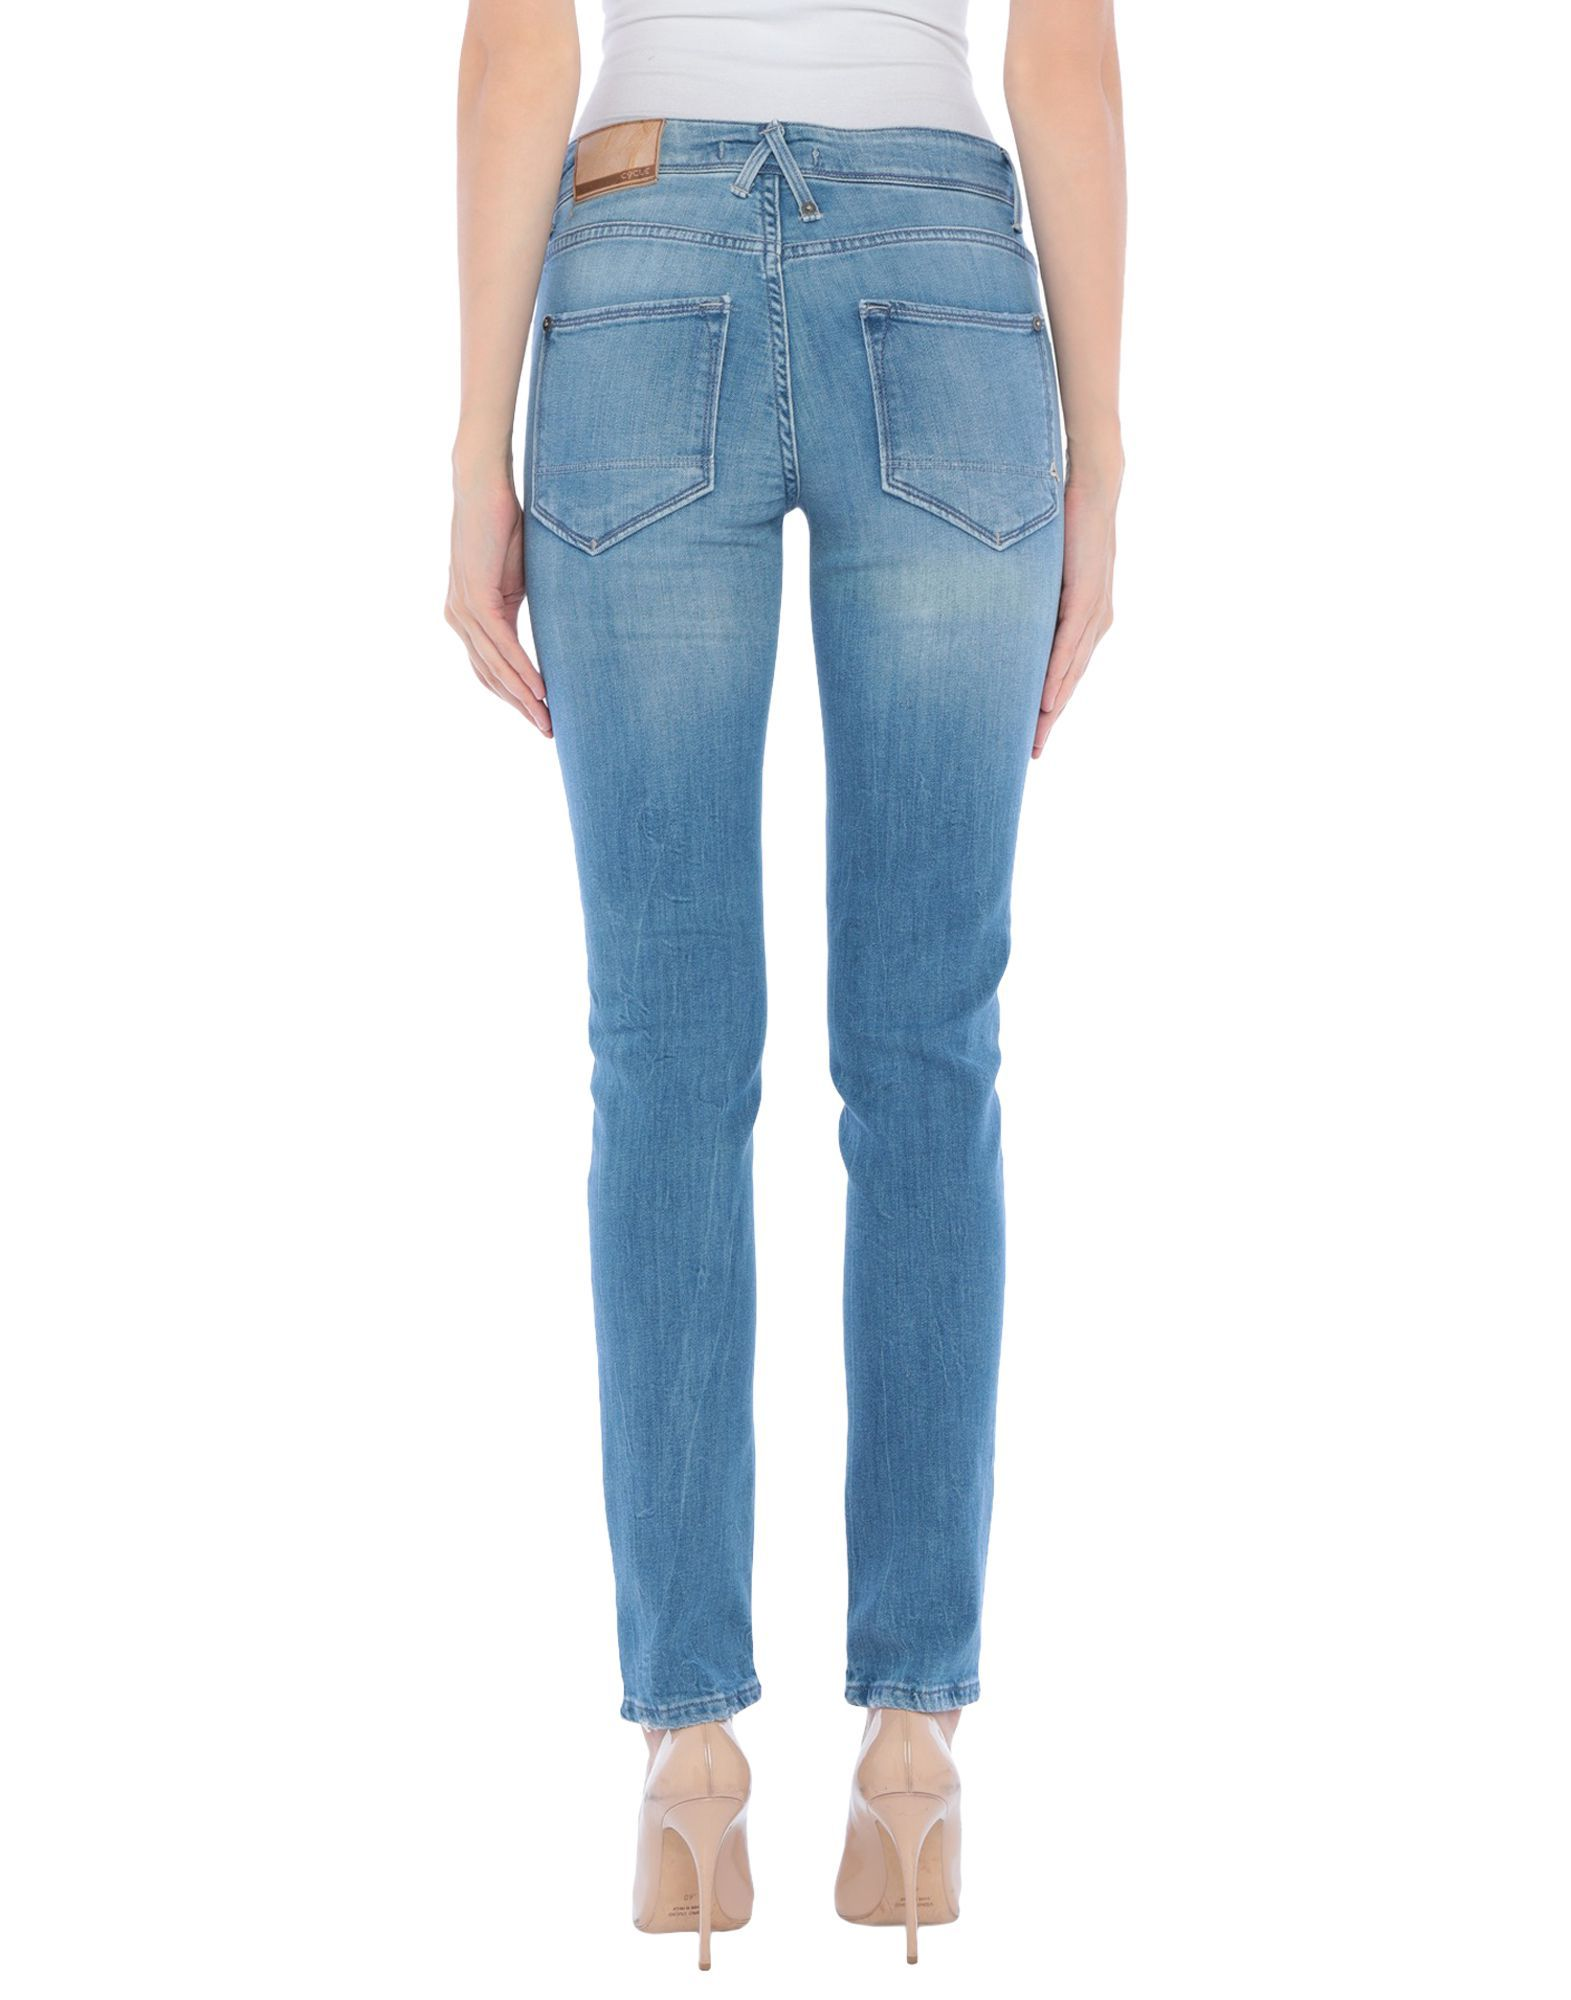 Cycle Woman Denim trousers Blue Cotton